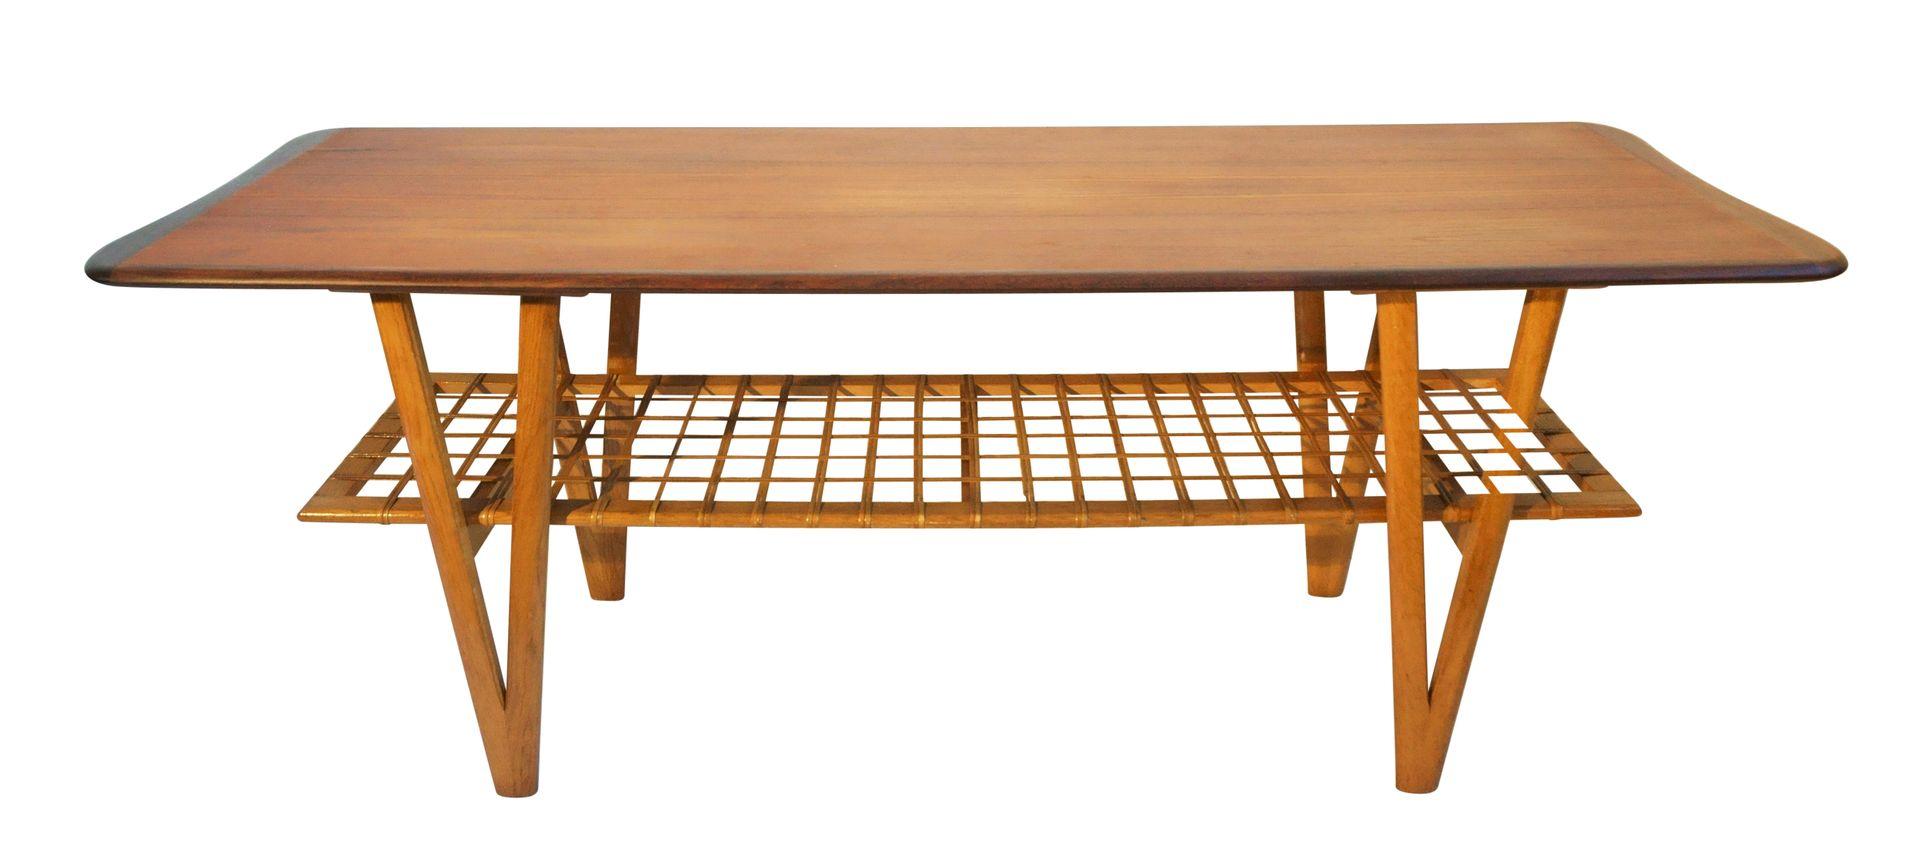 Vintage Danish Teak Coffee Table With V Shaped Legs